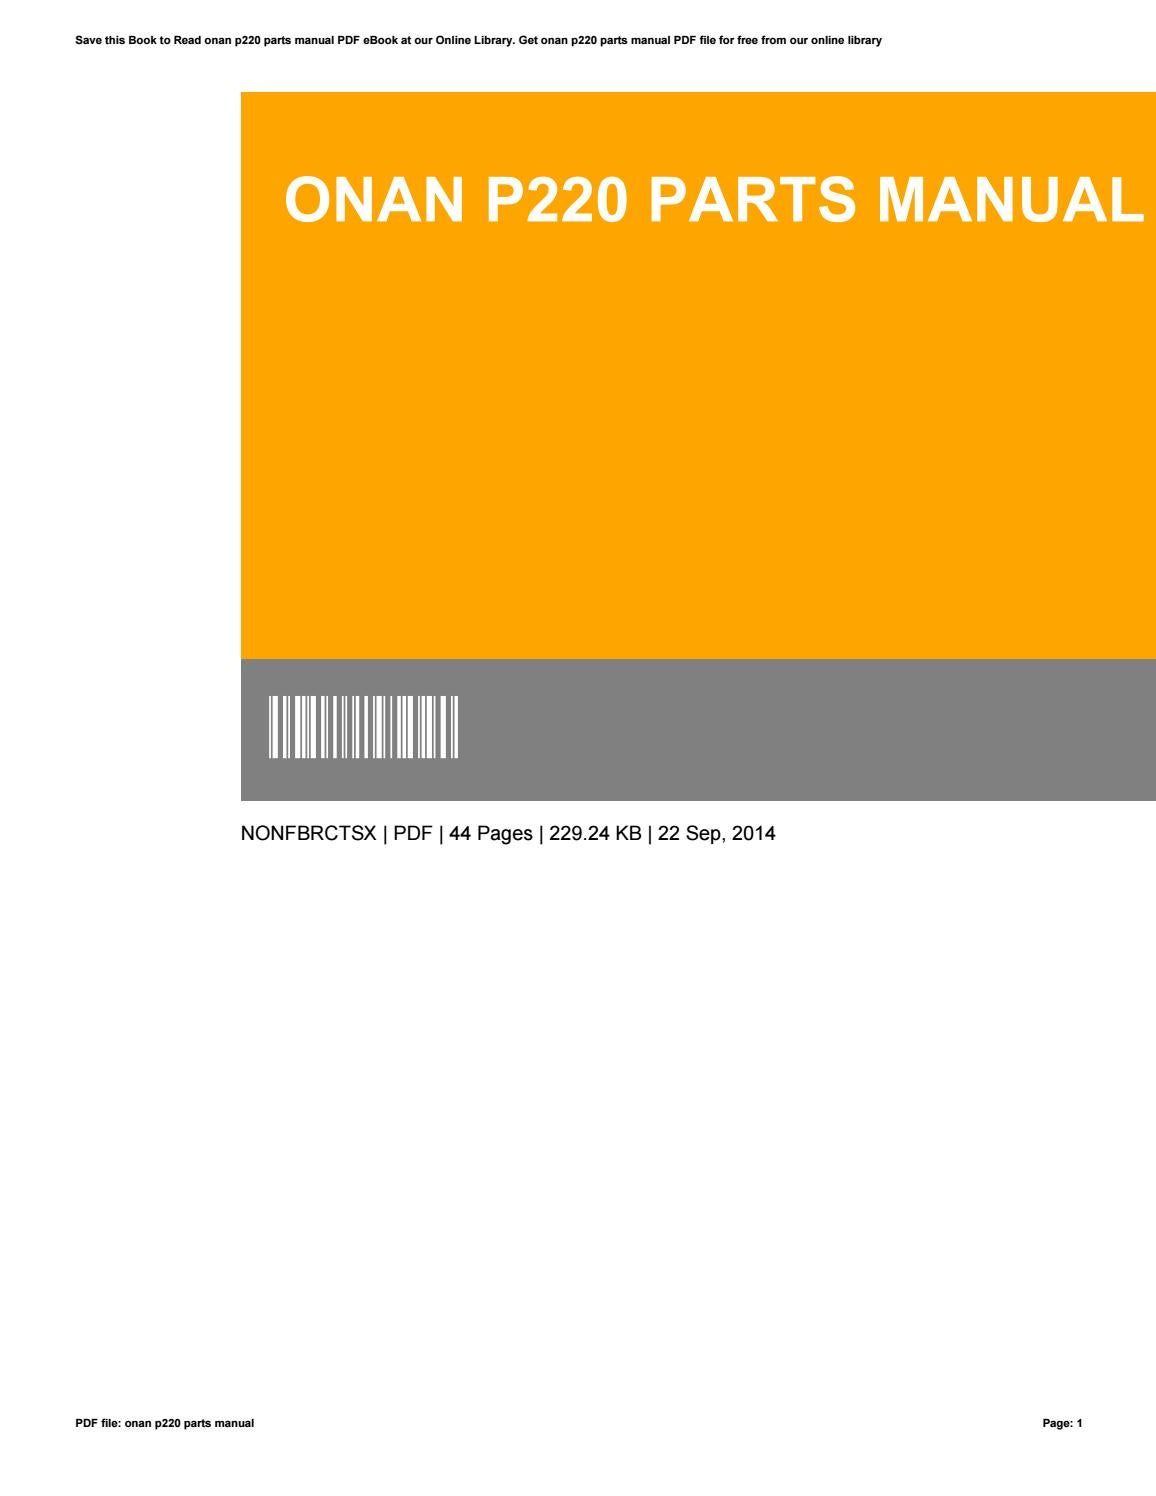 [DIAGRAM_5FD]  Onan p220 parts manual by maria80kristina - issuu | Wiring Diagram Onan P220 |  | Issuu